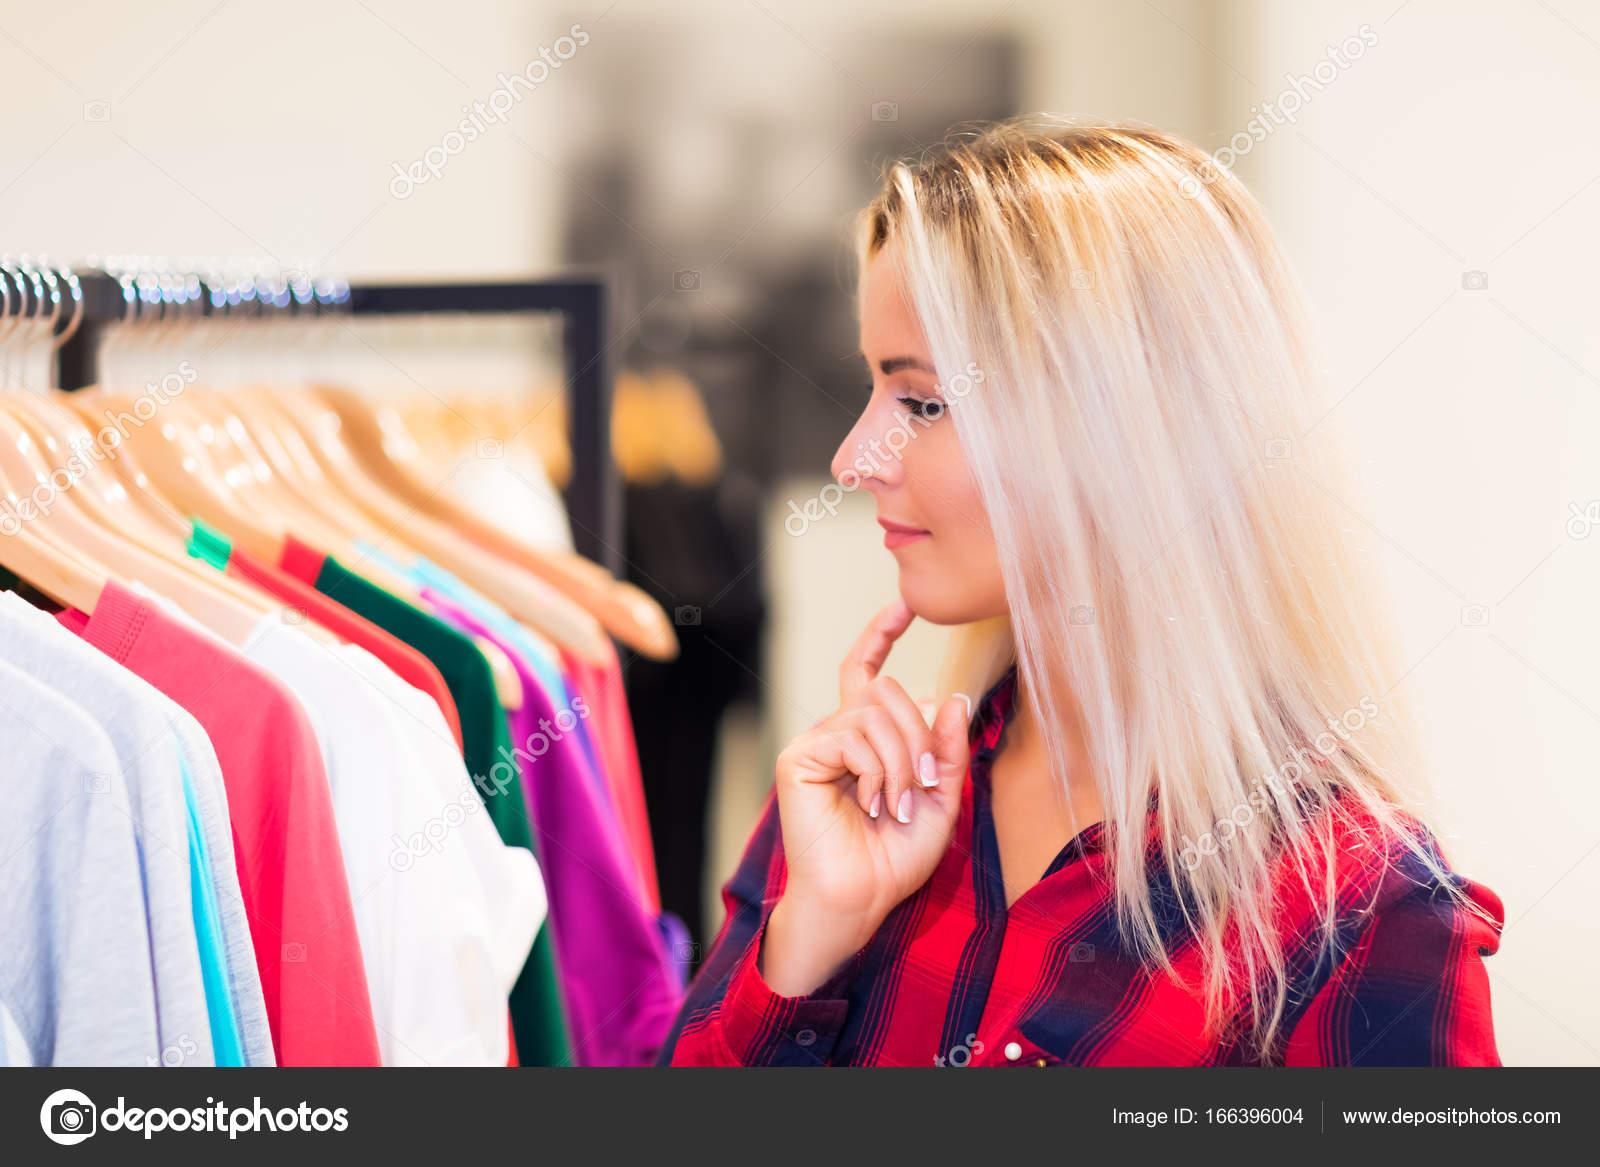 16226444b6e8 Mladá žena nakupuje v obchodě módy — Stock Fotografie © scanrail ...